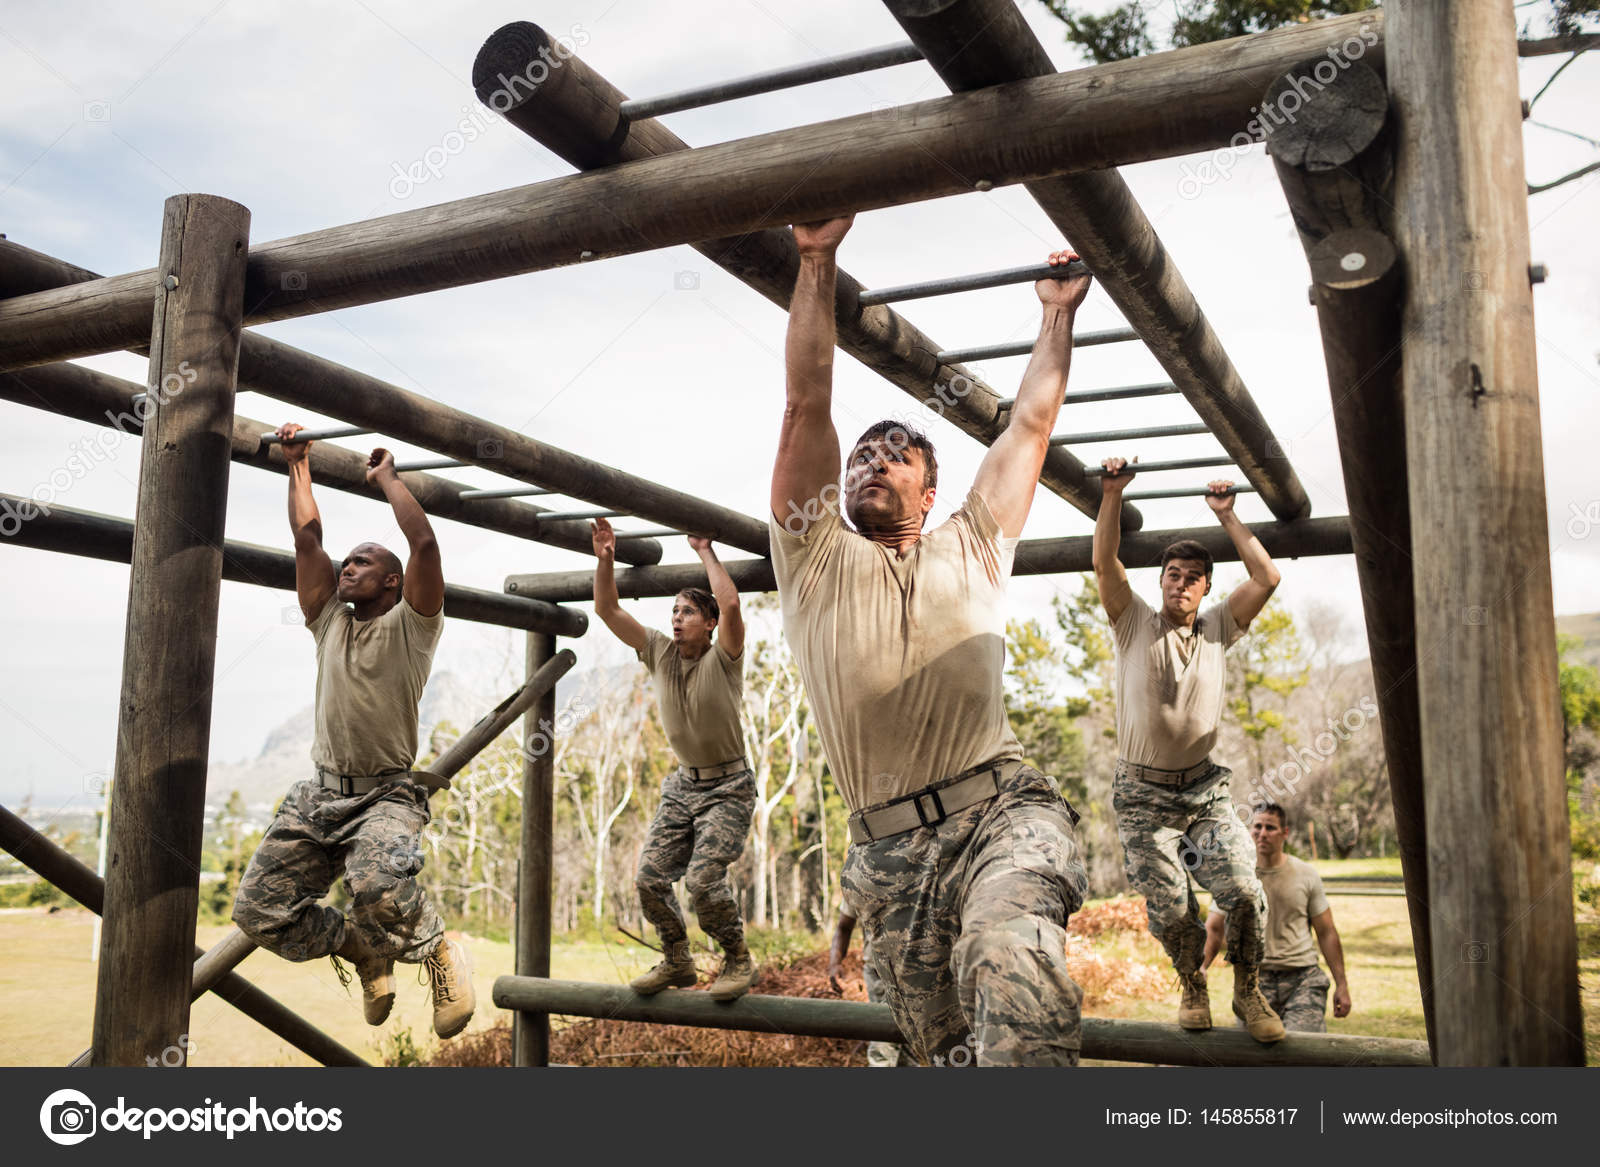 Klettergerüst Boot : Militärische soldat klettern klettergerüst boot camp u stockvideo